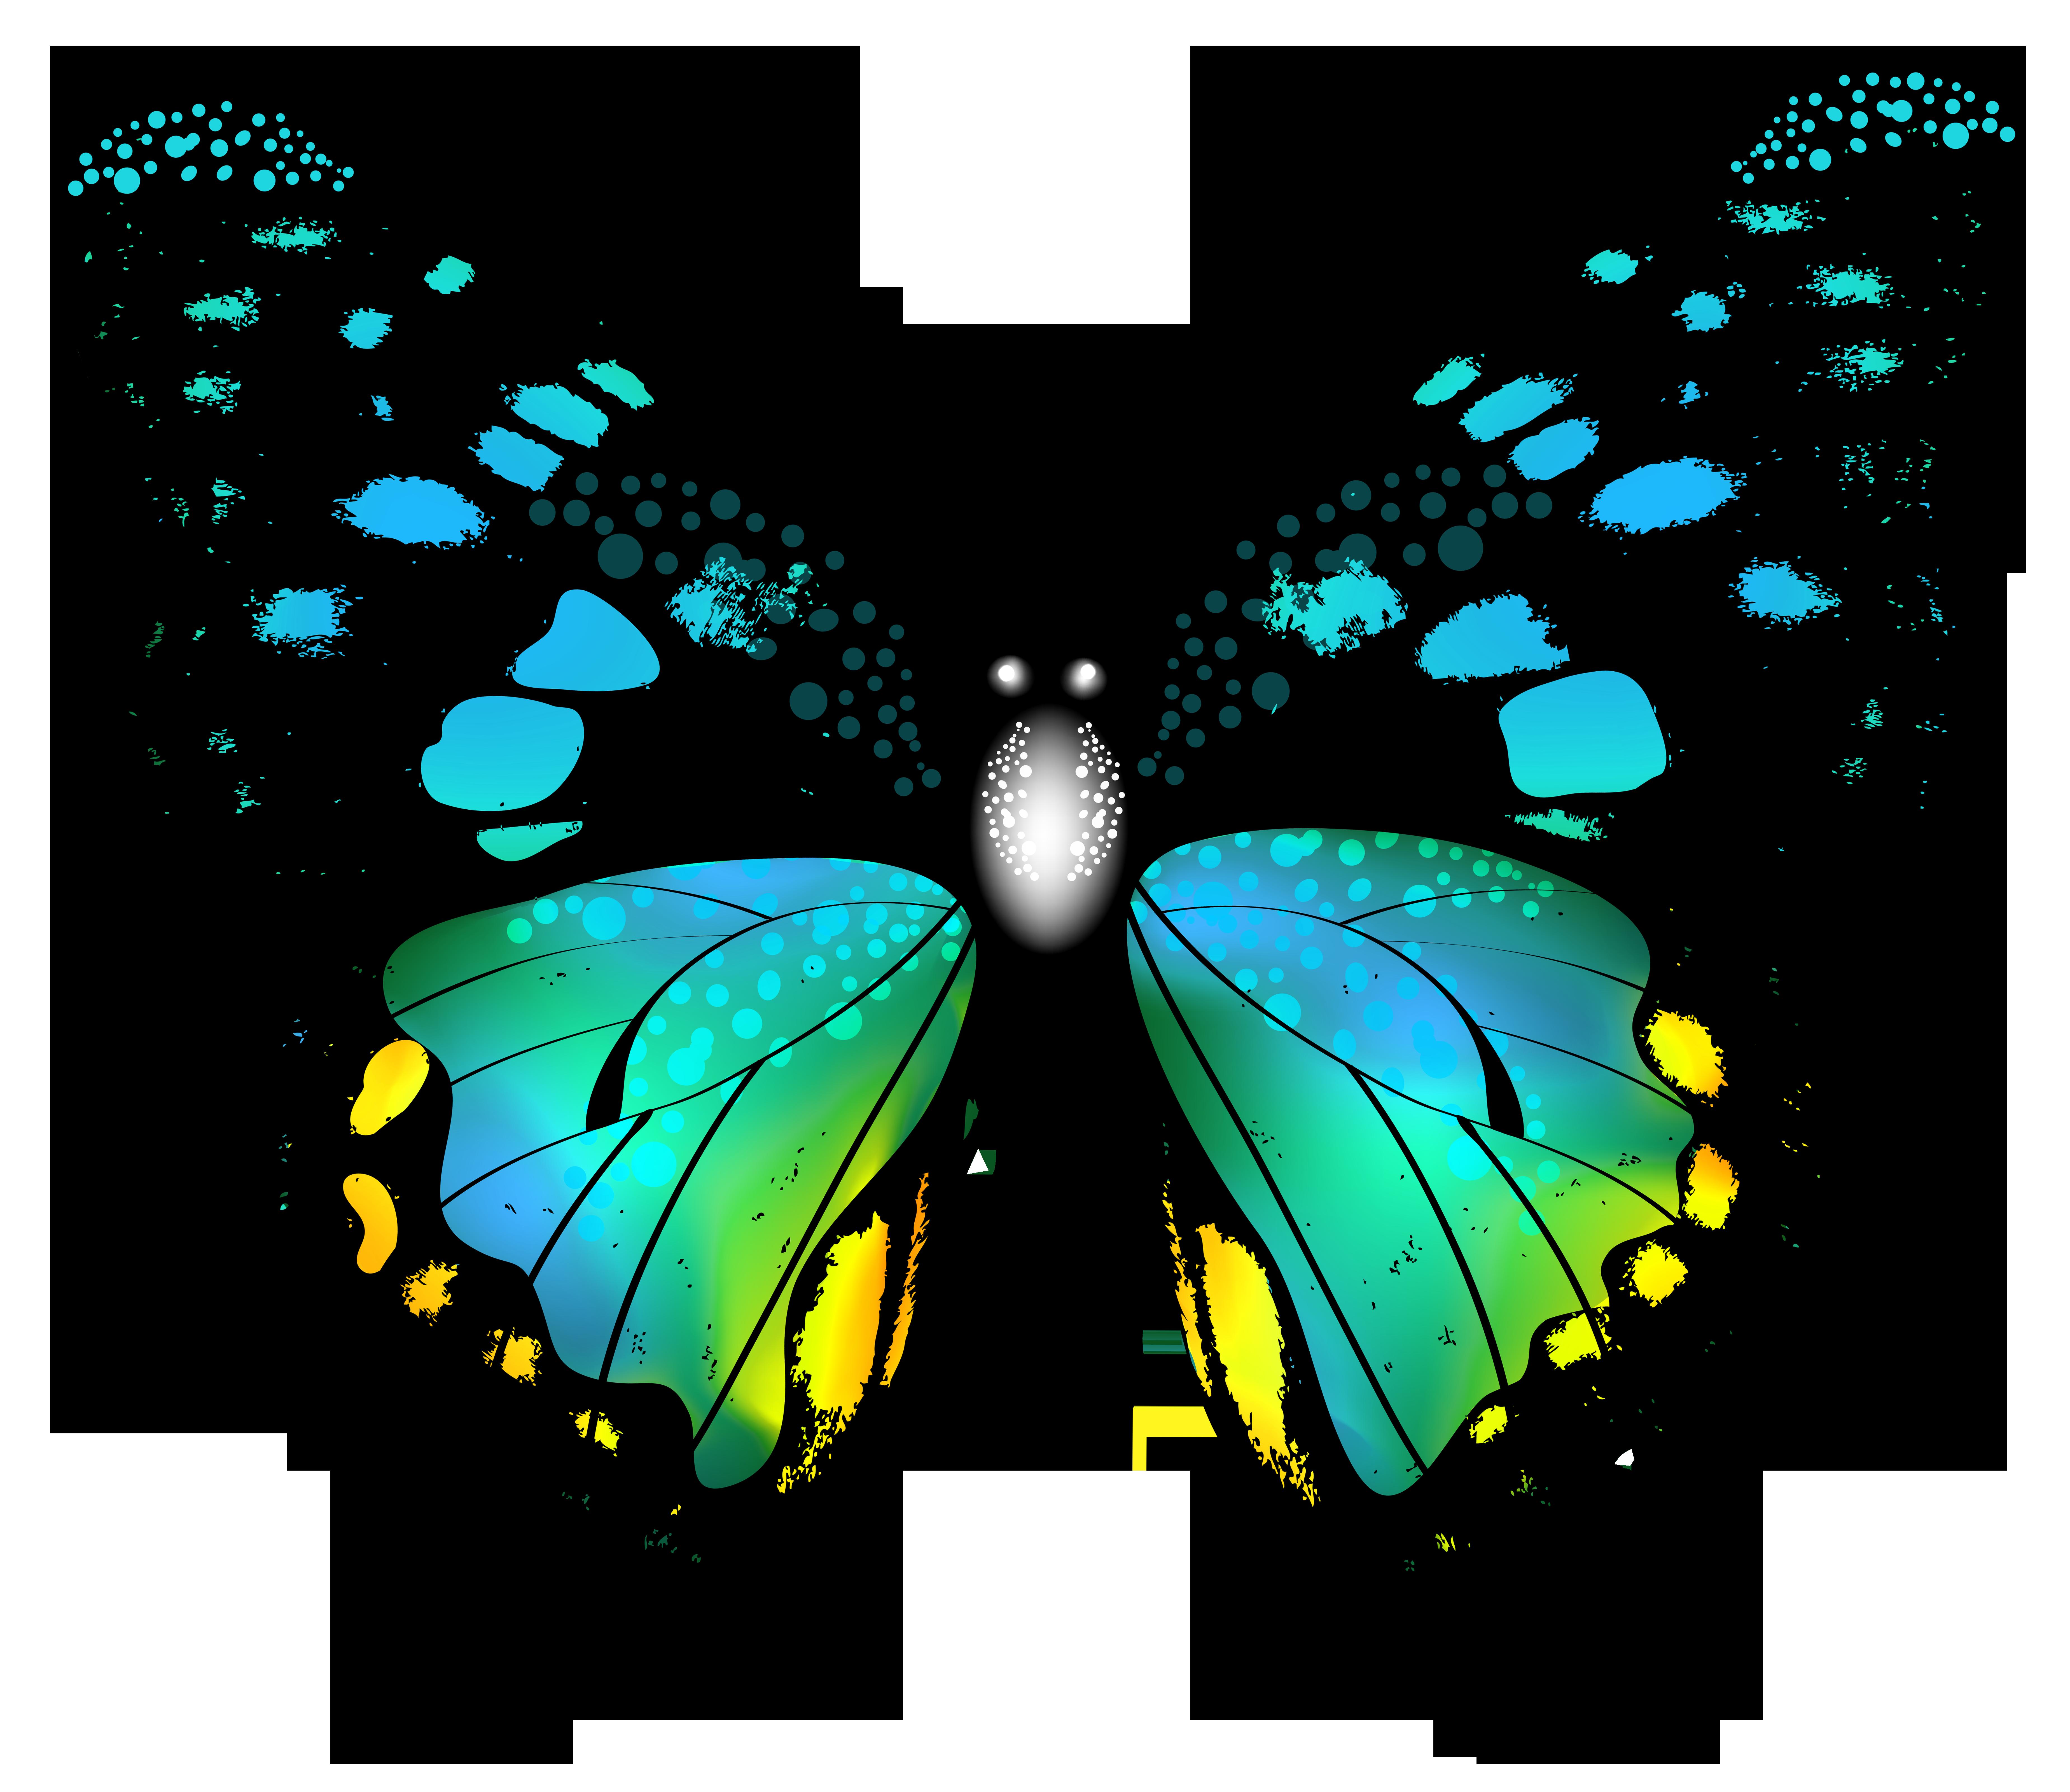 7394x6401 Pin By Merryann Palmer On Butterflies Butterfly